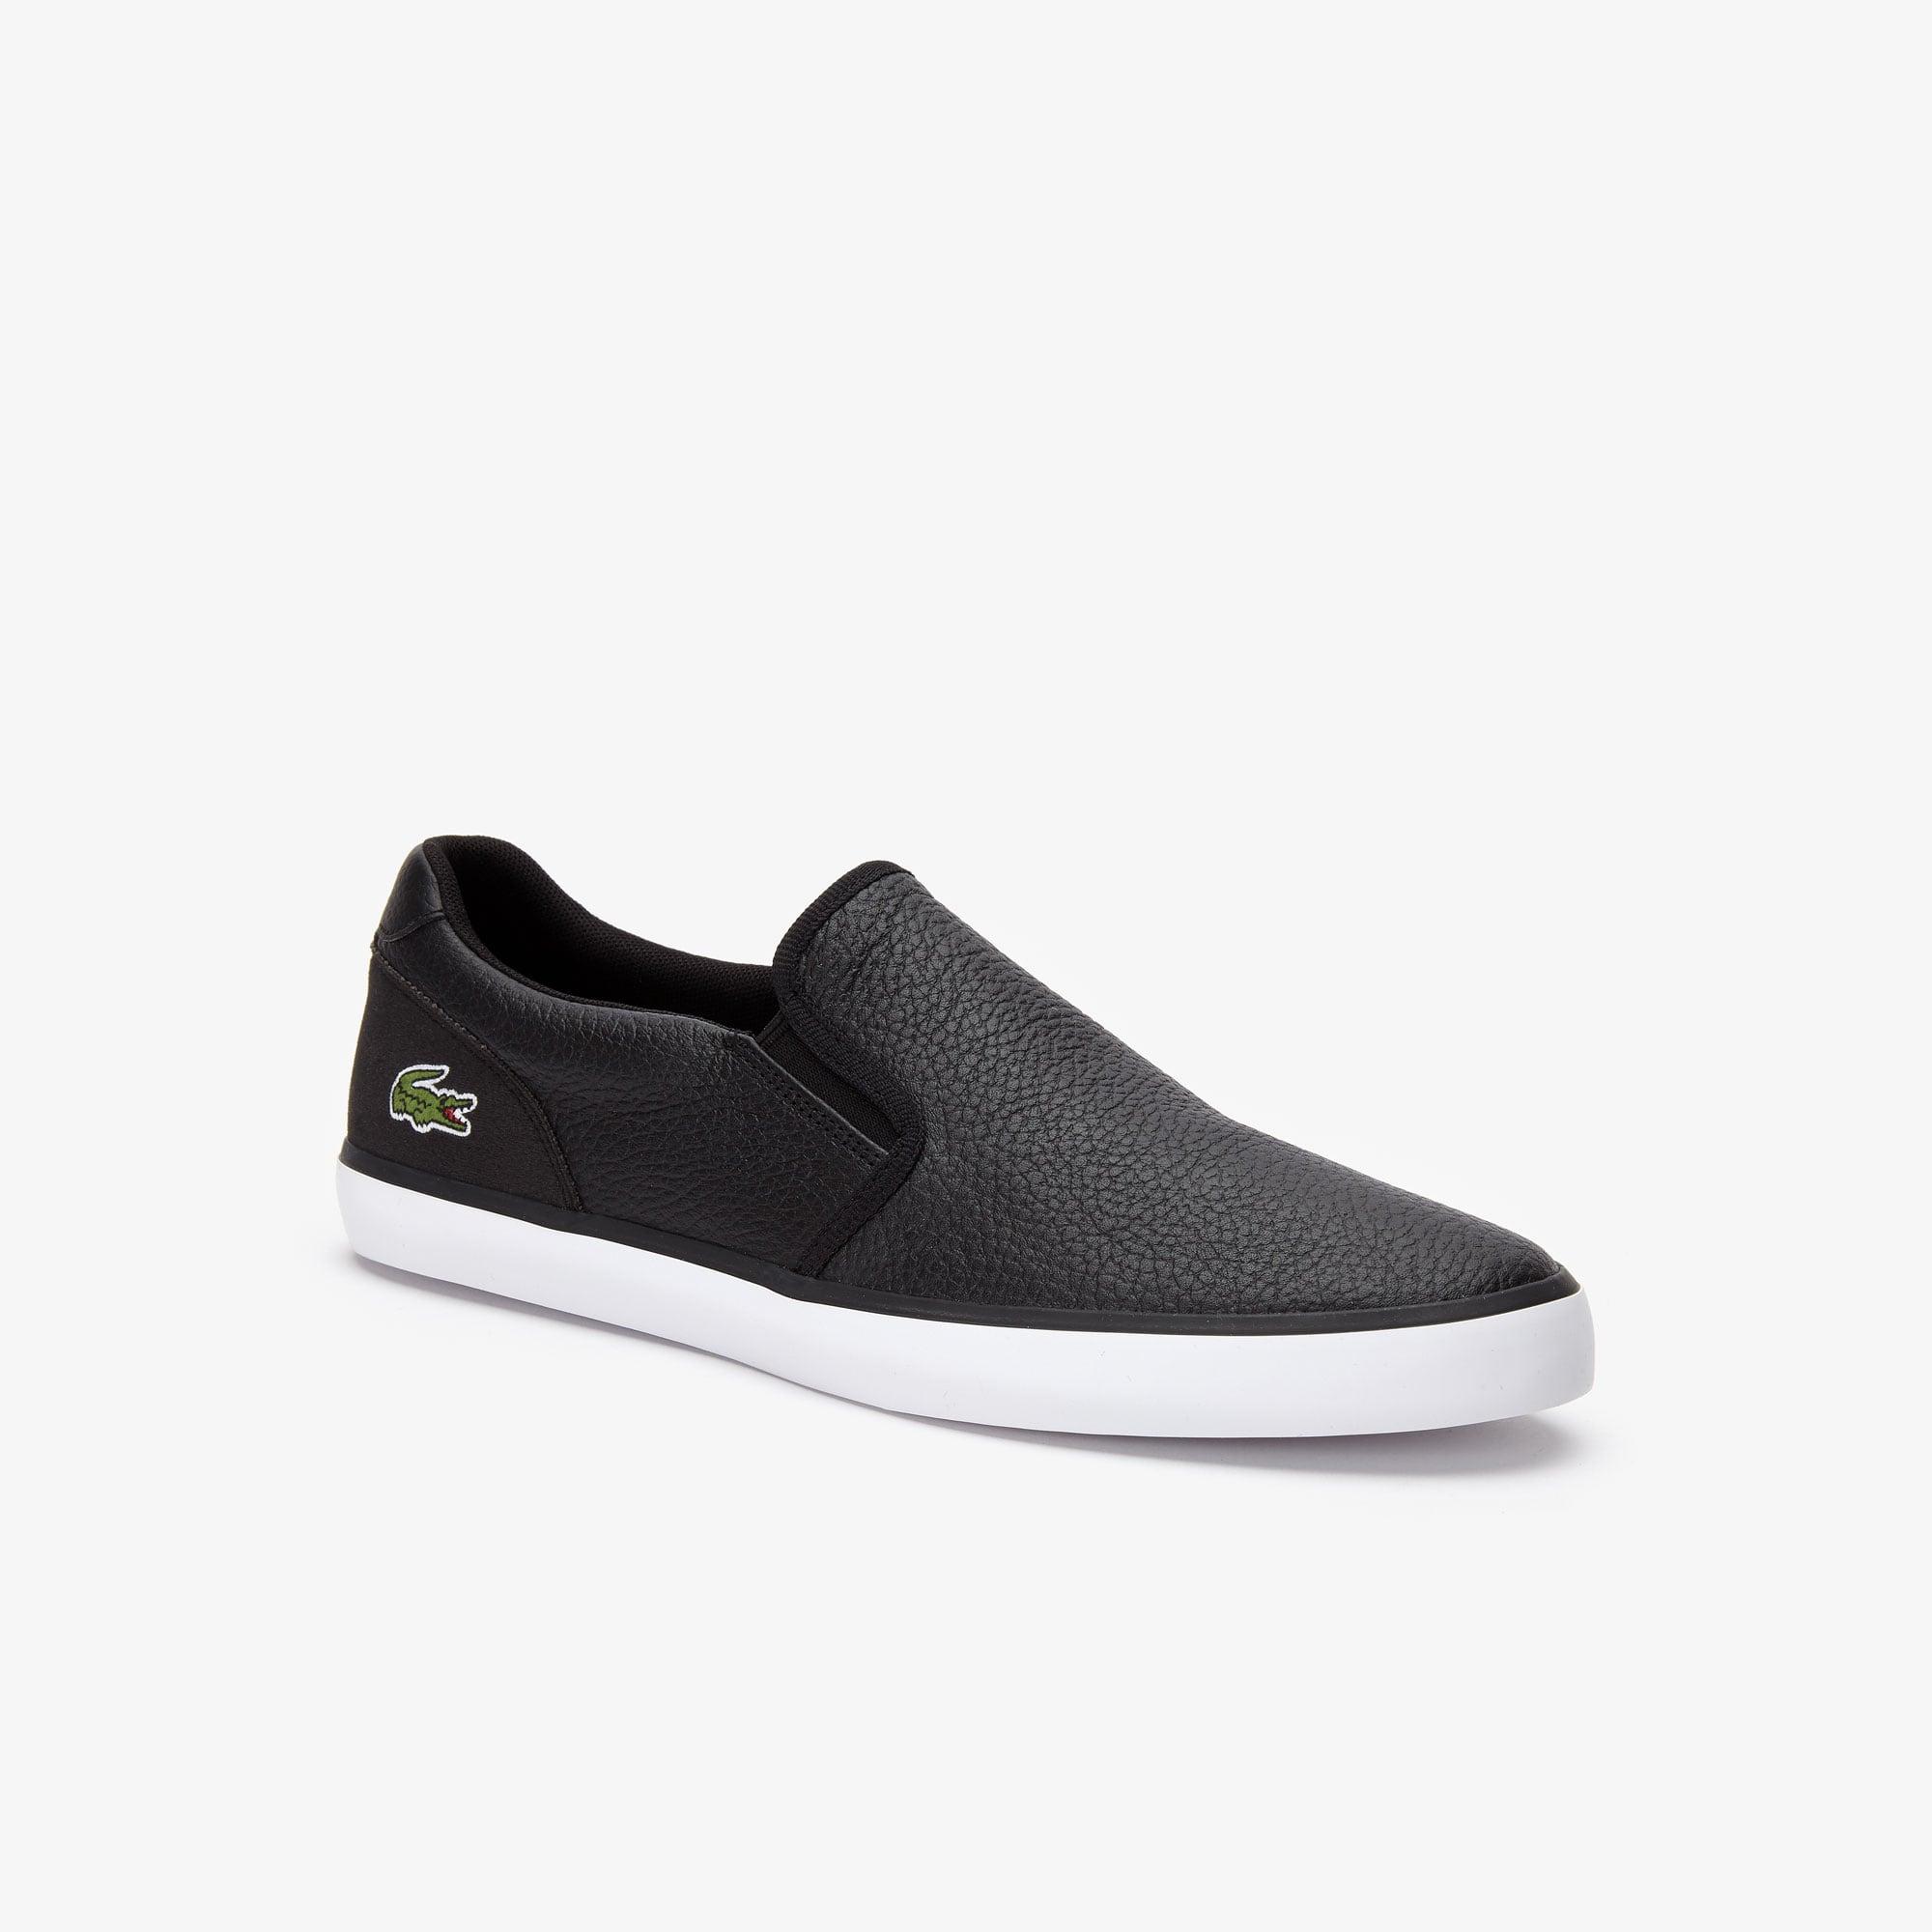 Jouer Leather Slip-On Sneakers   LACOSTE